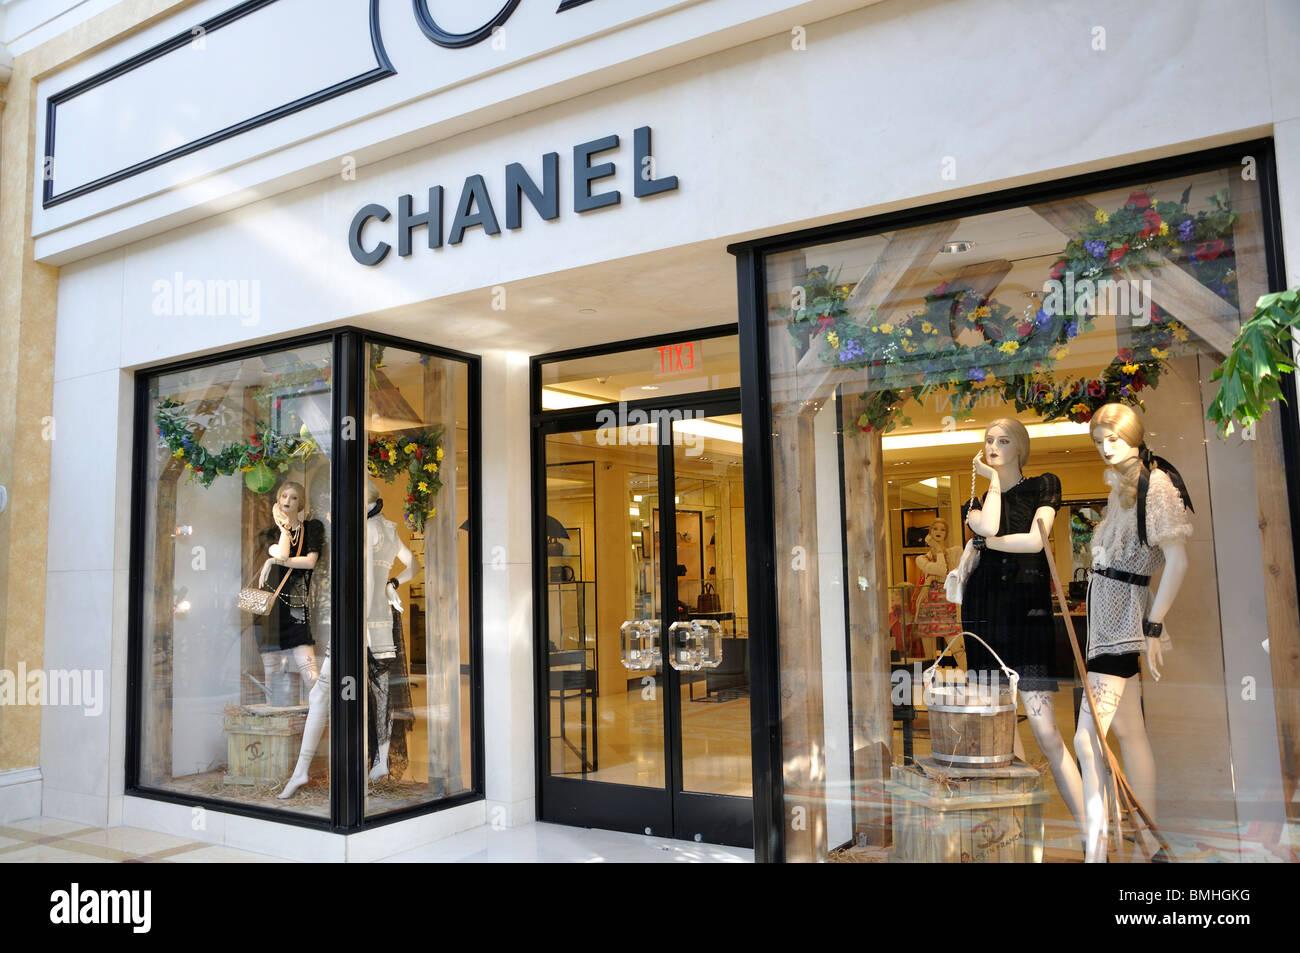 chanel store at bellagio hotel las vegas nevada usa